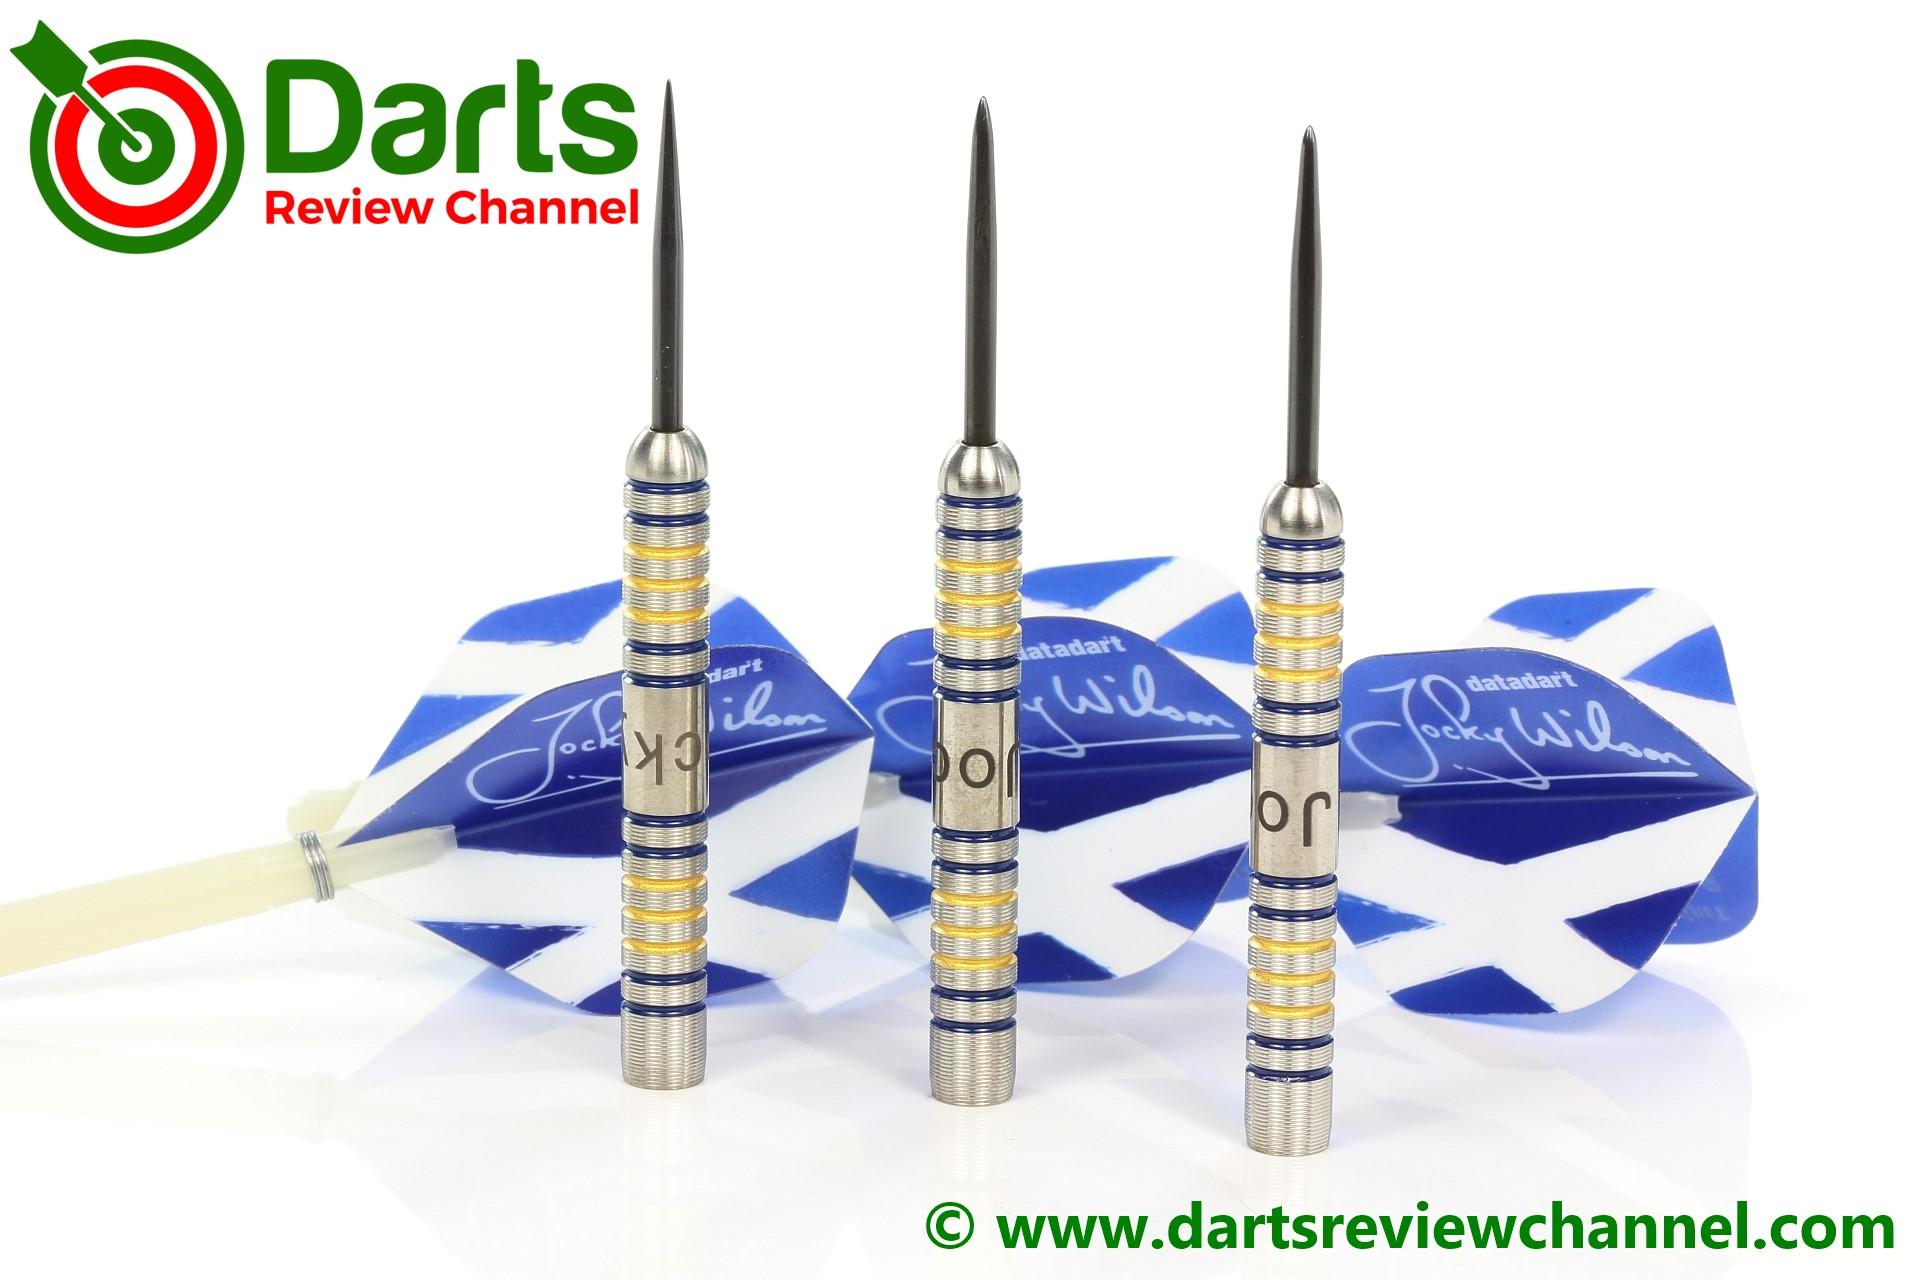 Datadart Jocky Wilson 26g Ghost Grip Tungsten Darts Set